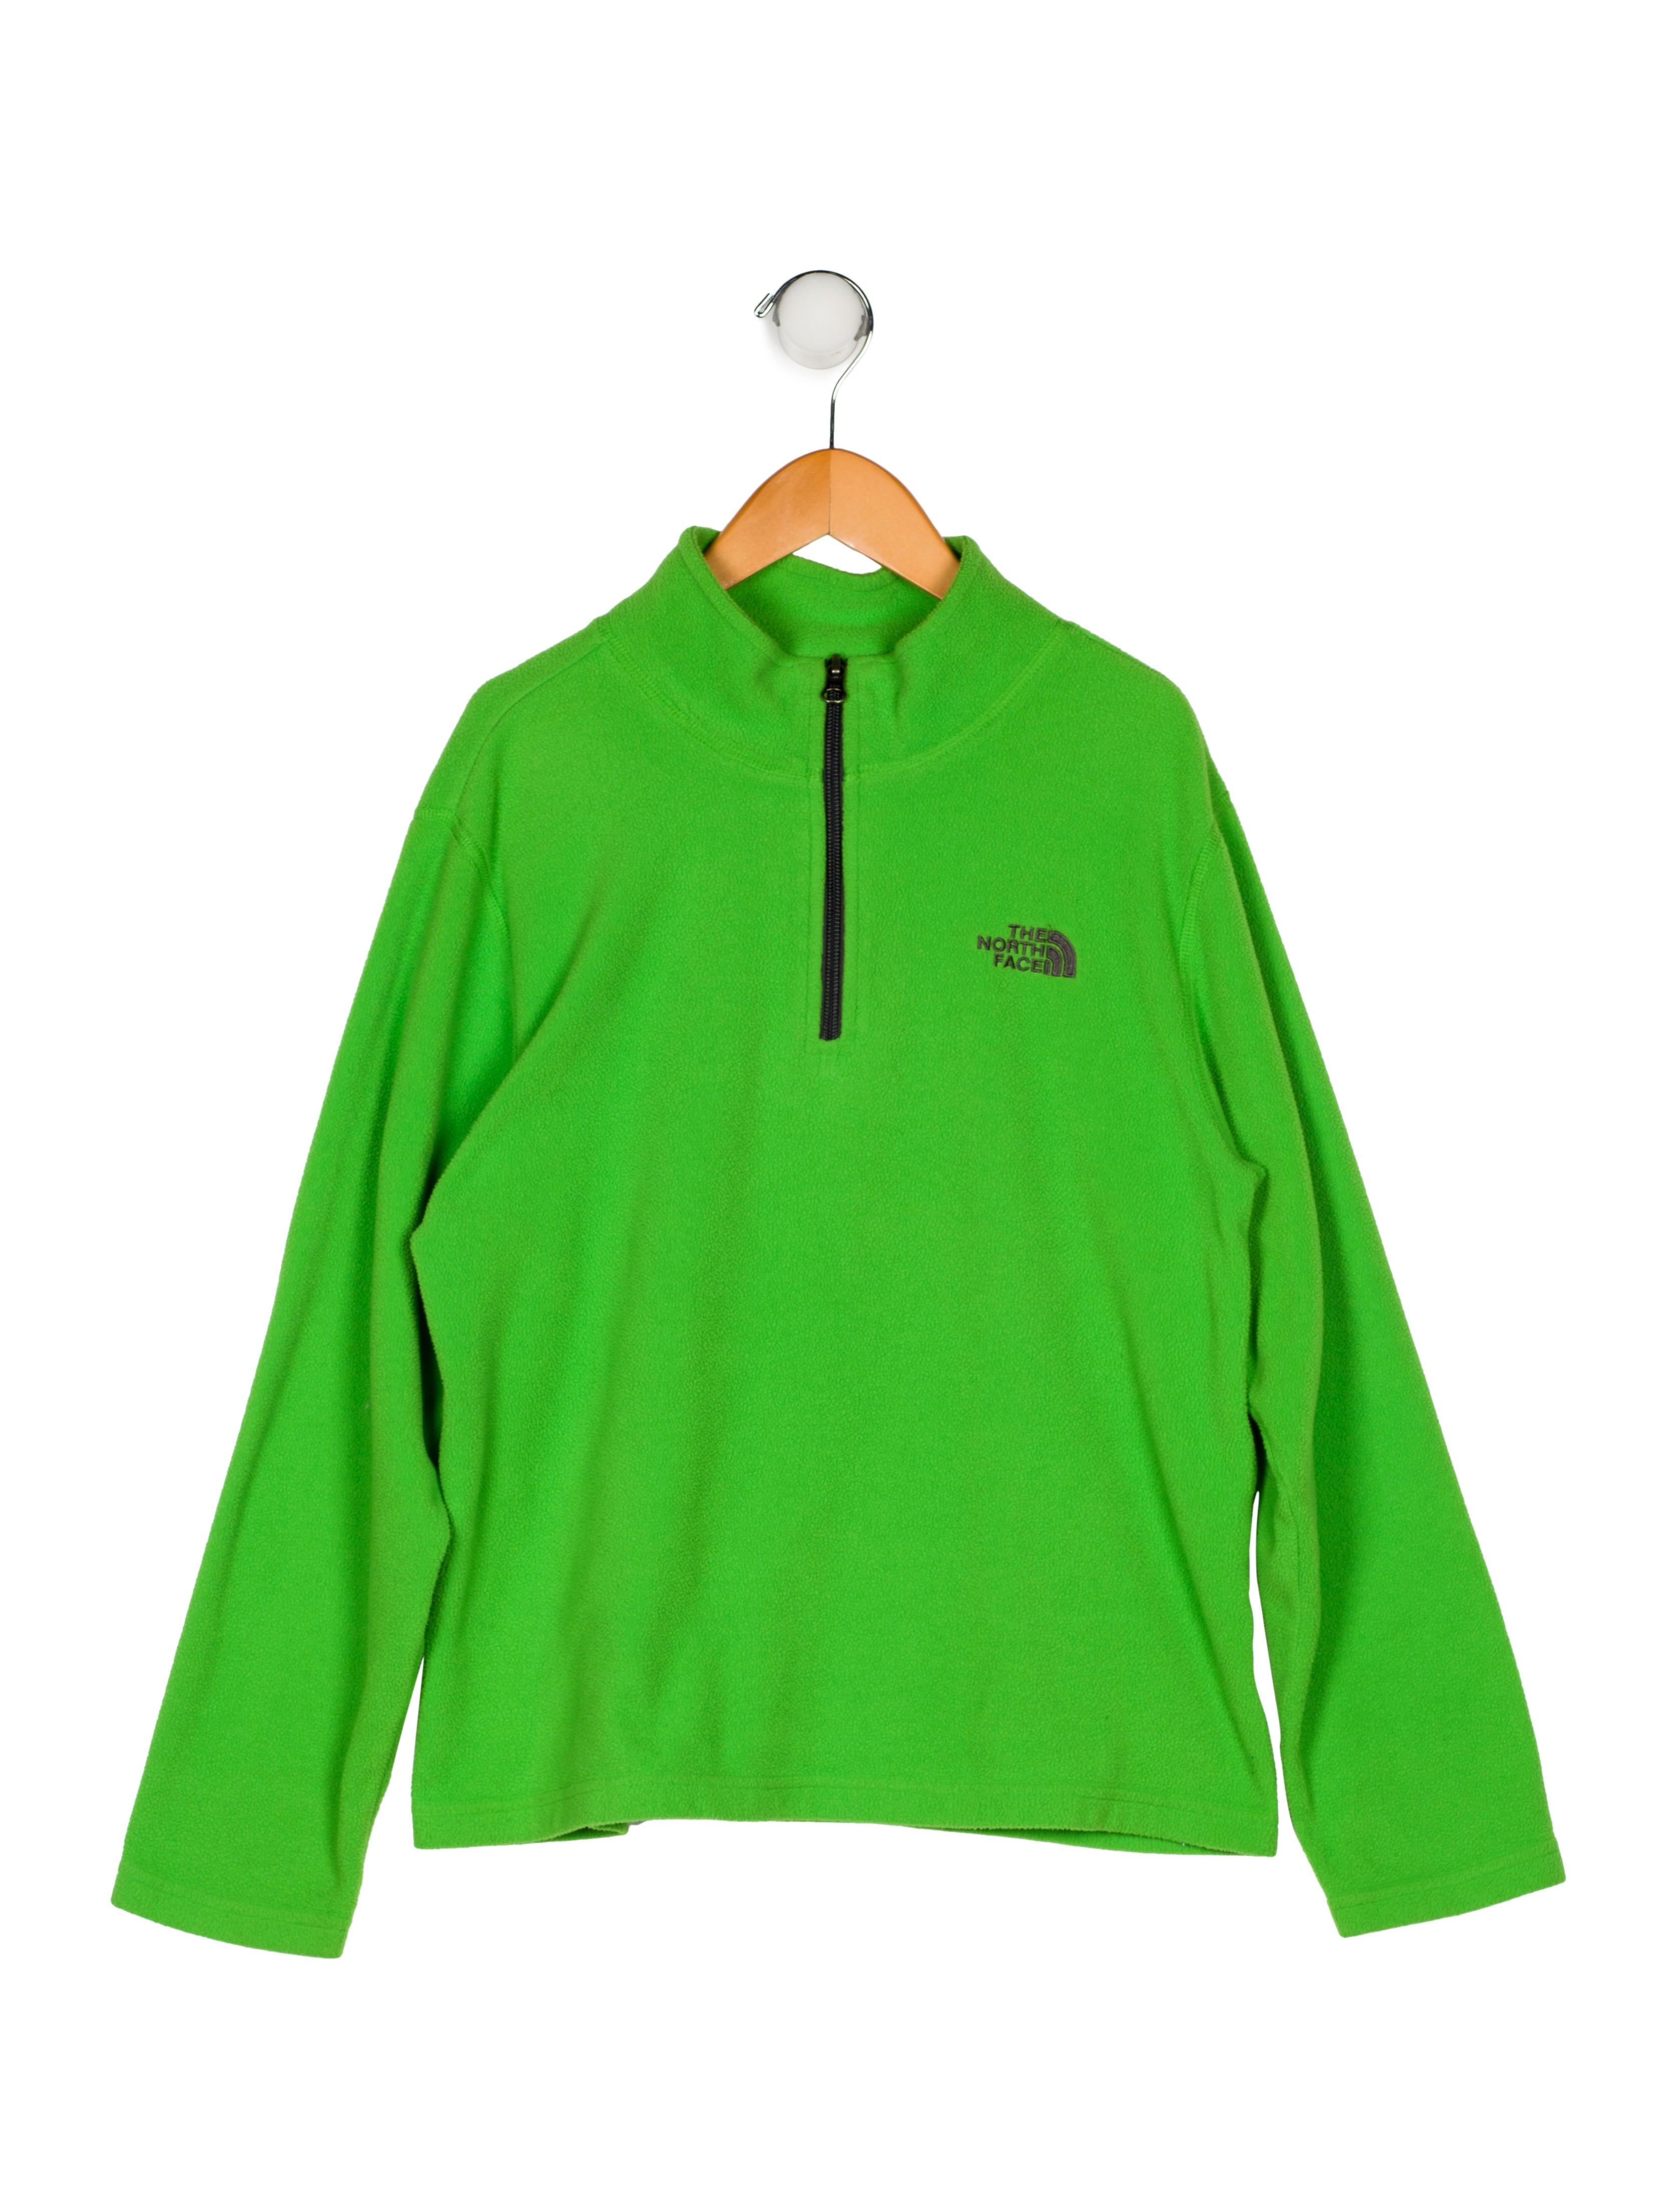 1360c1b27 The North Face Boys' Fleece Mock Neck Sweatshirt - Boys - WNORH24806 ...